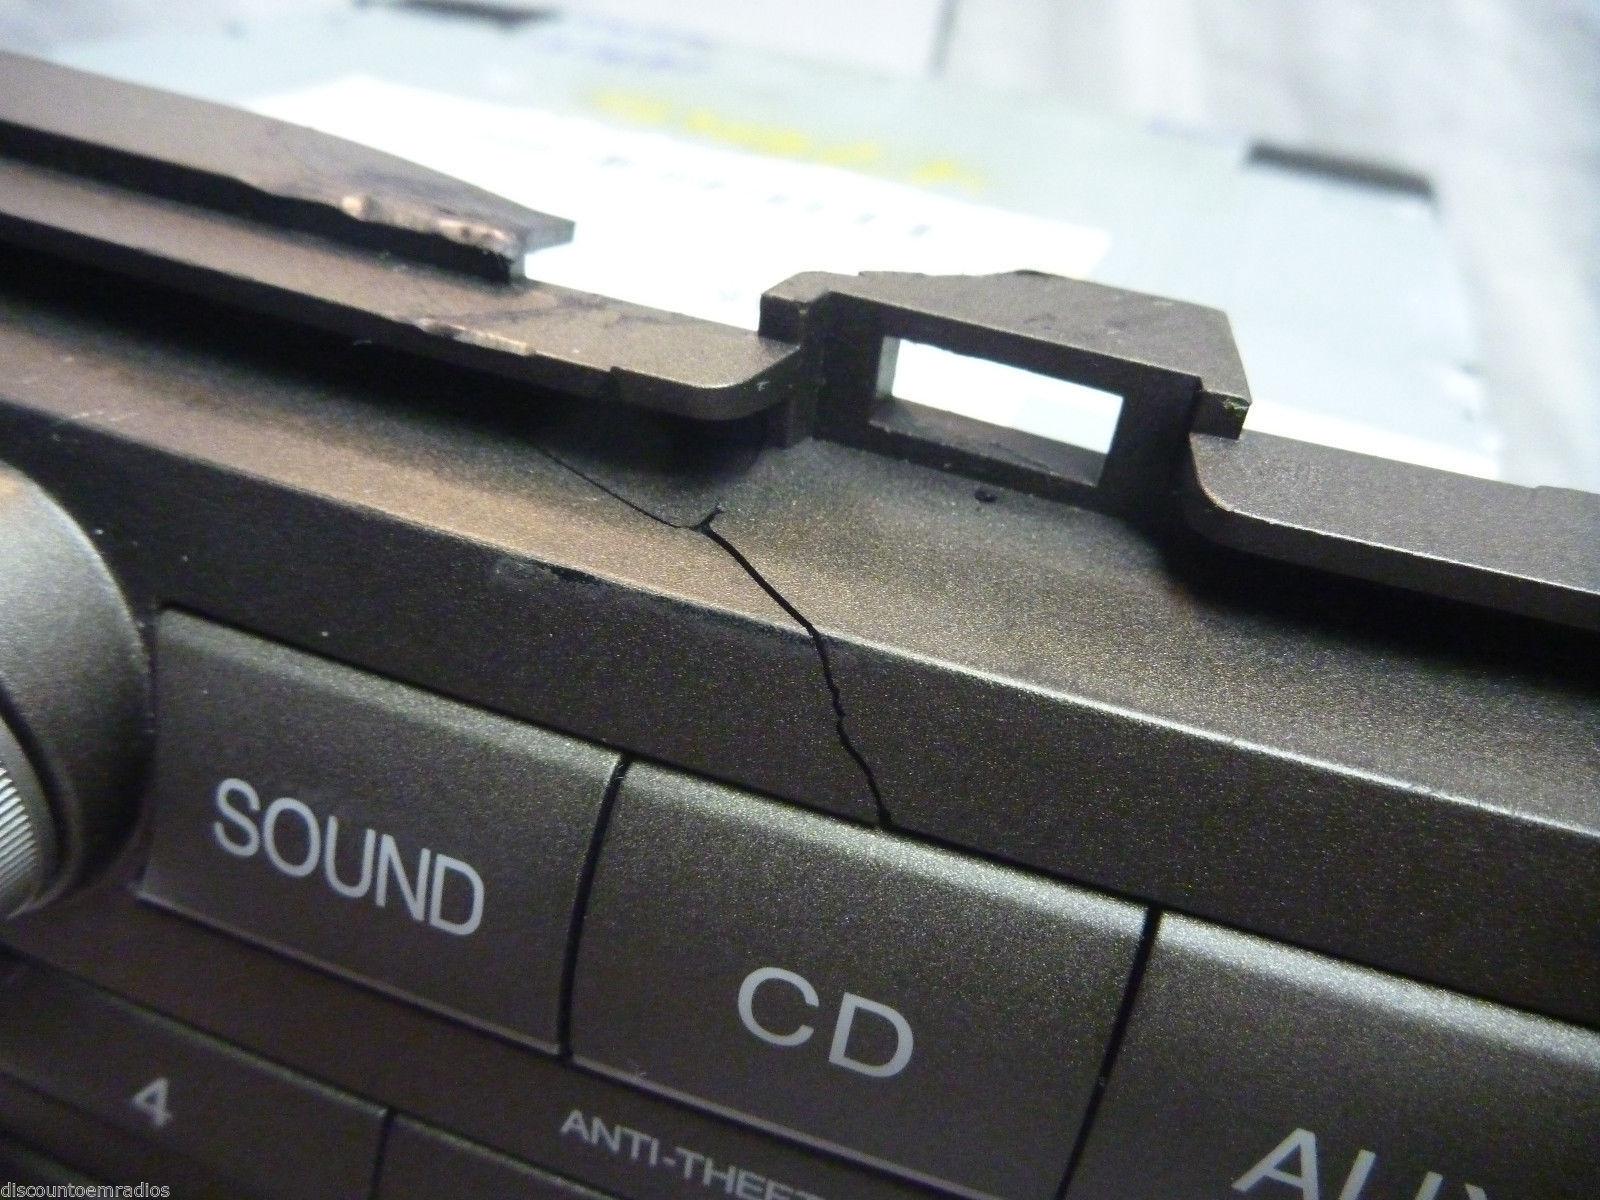 08-12 Honda Accord Gps XM Navigation Radio Control & Code 39101-TA0-A814 3TA0 C4